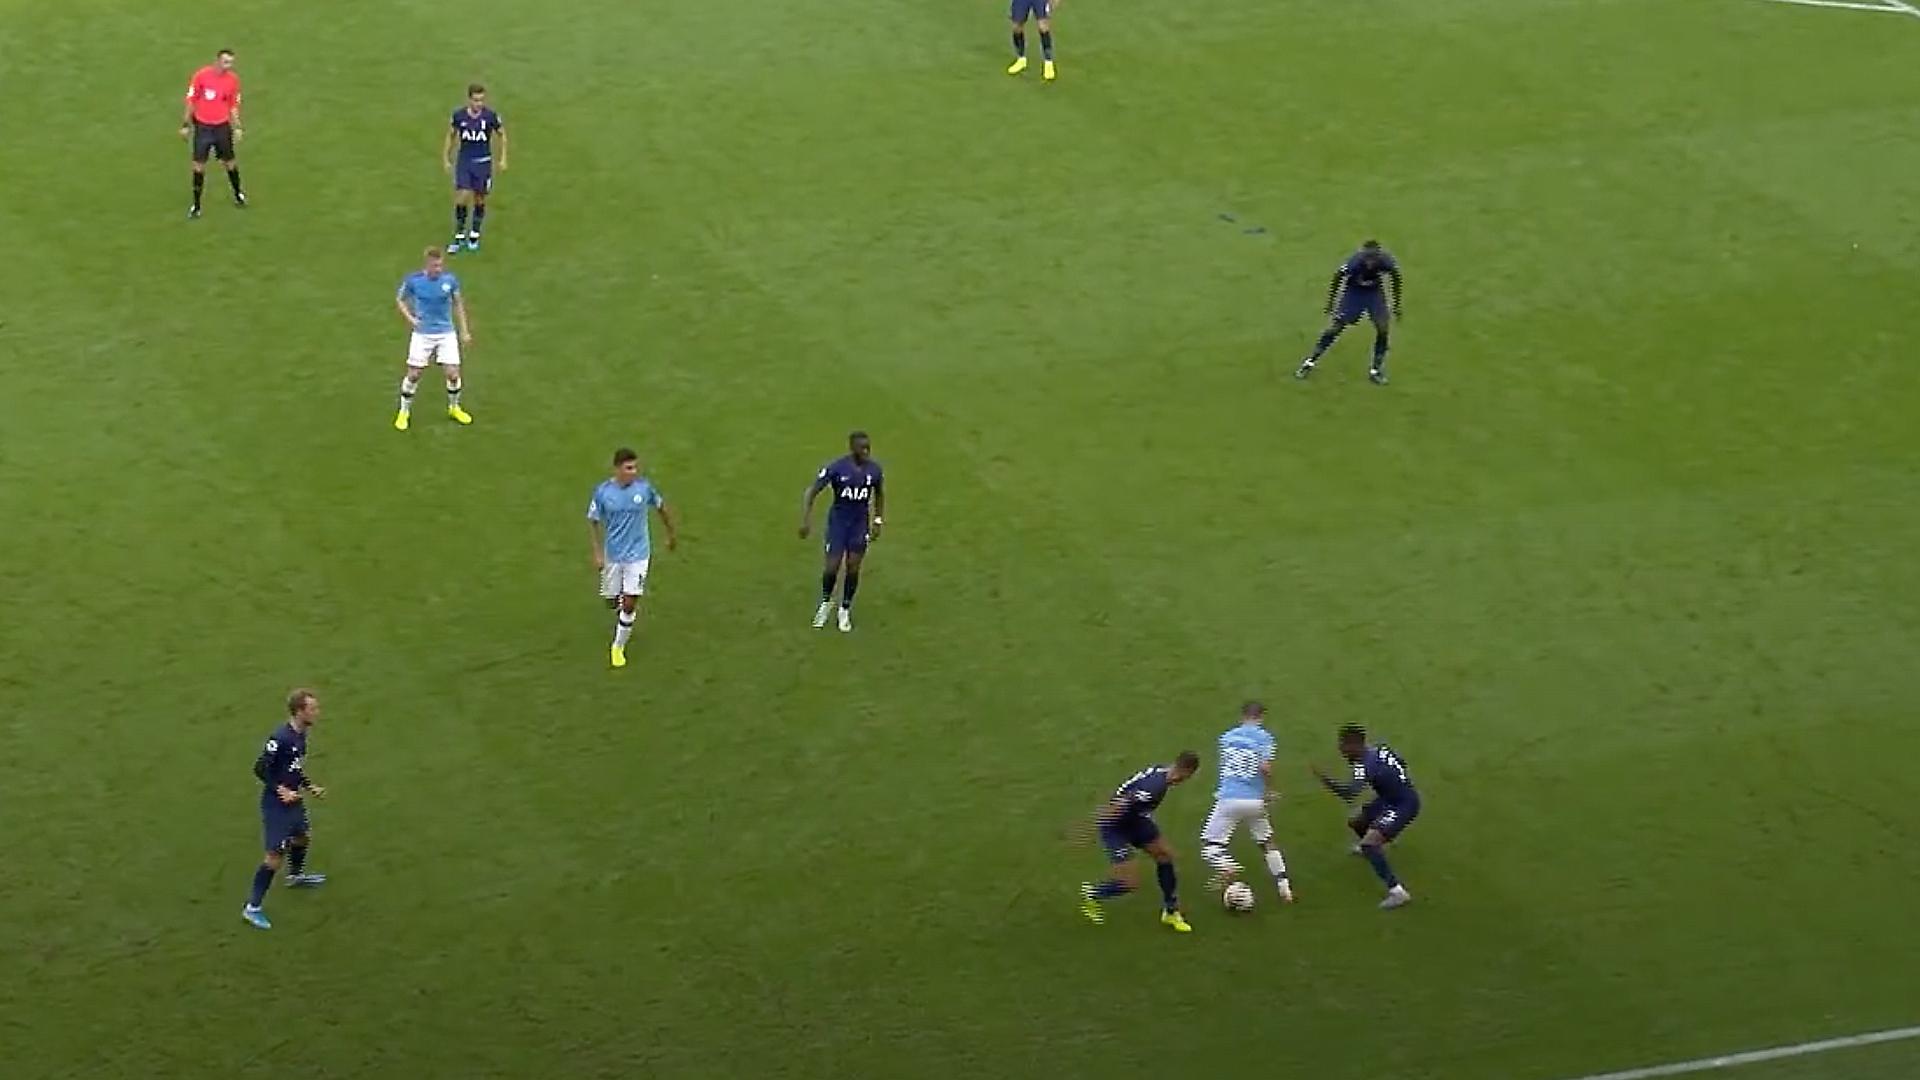 FIFA 21 agile dribbling